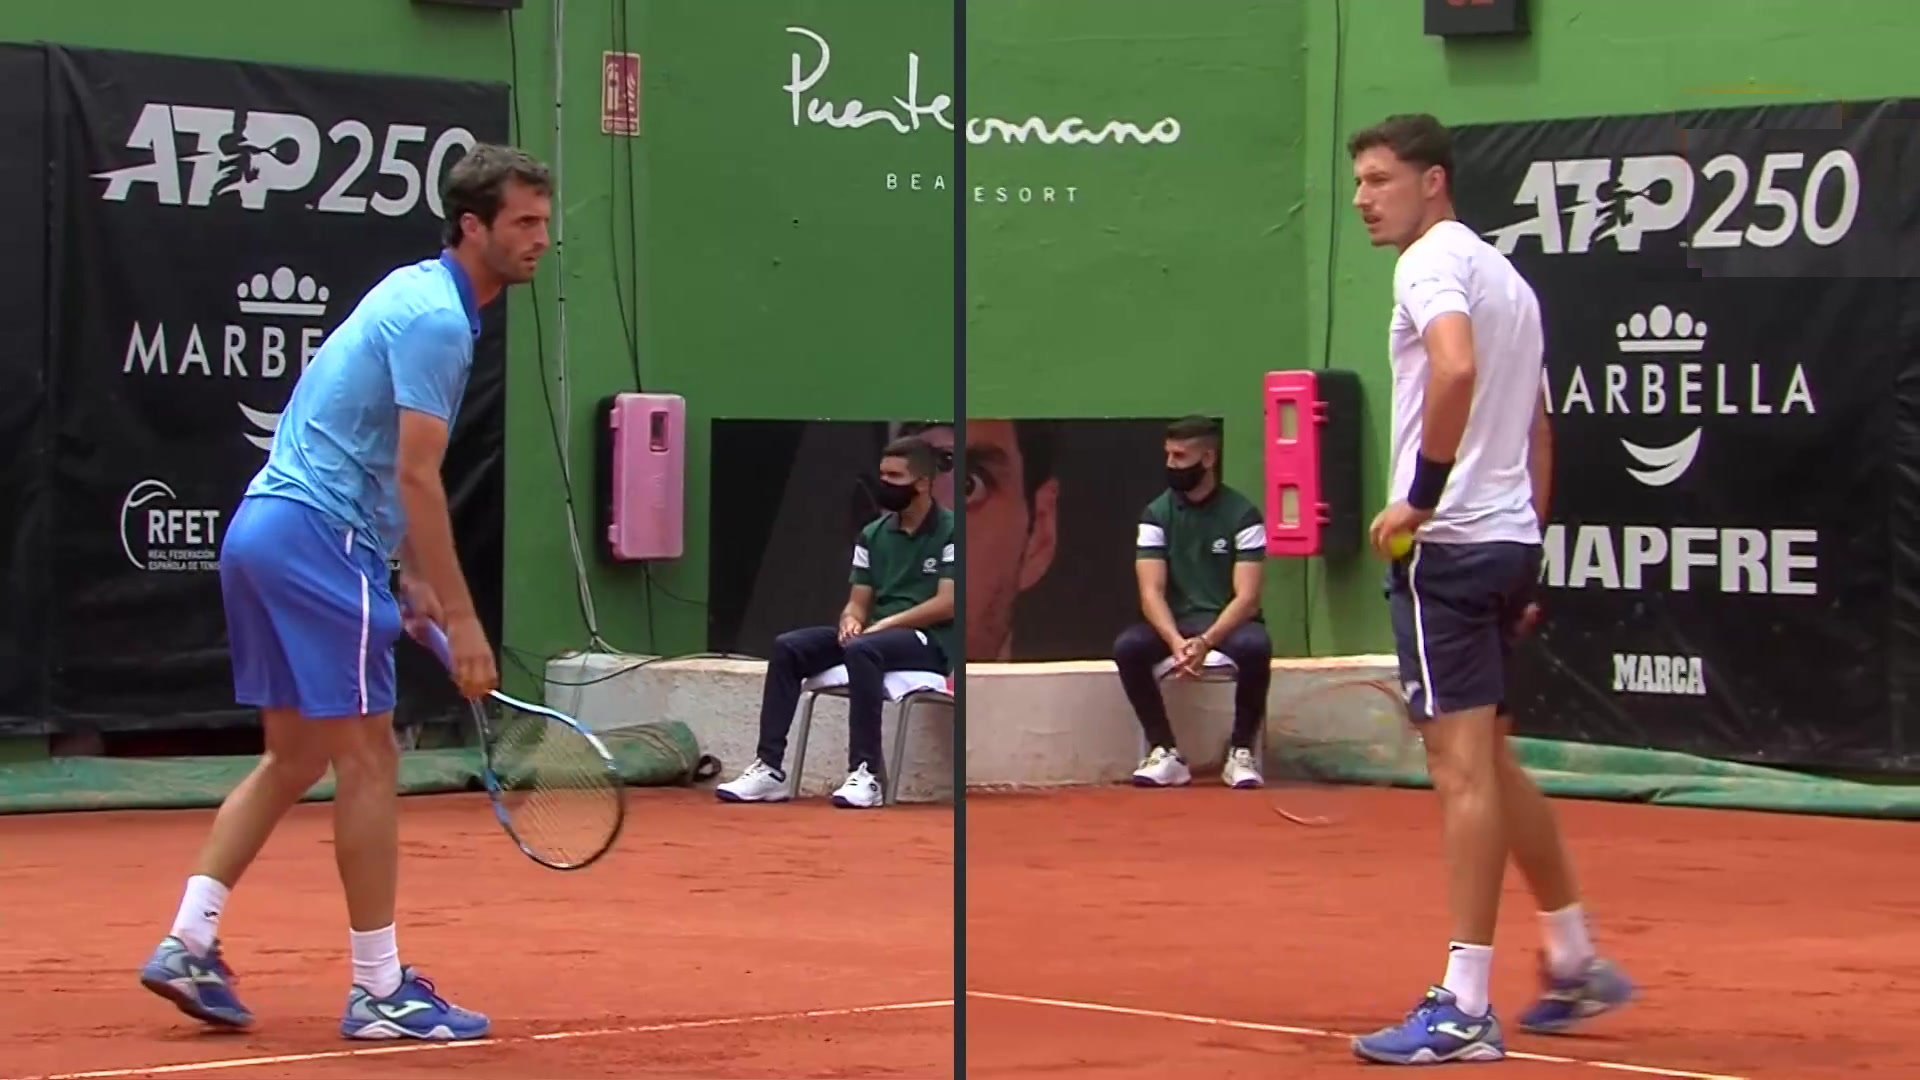 ATP 250 Torneo Marbella, 1ª semifinal: P. Carreño - A. Ramos